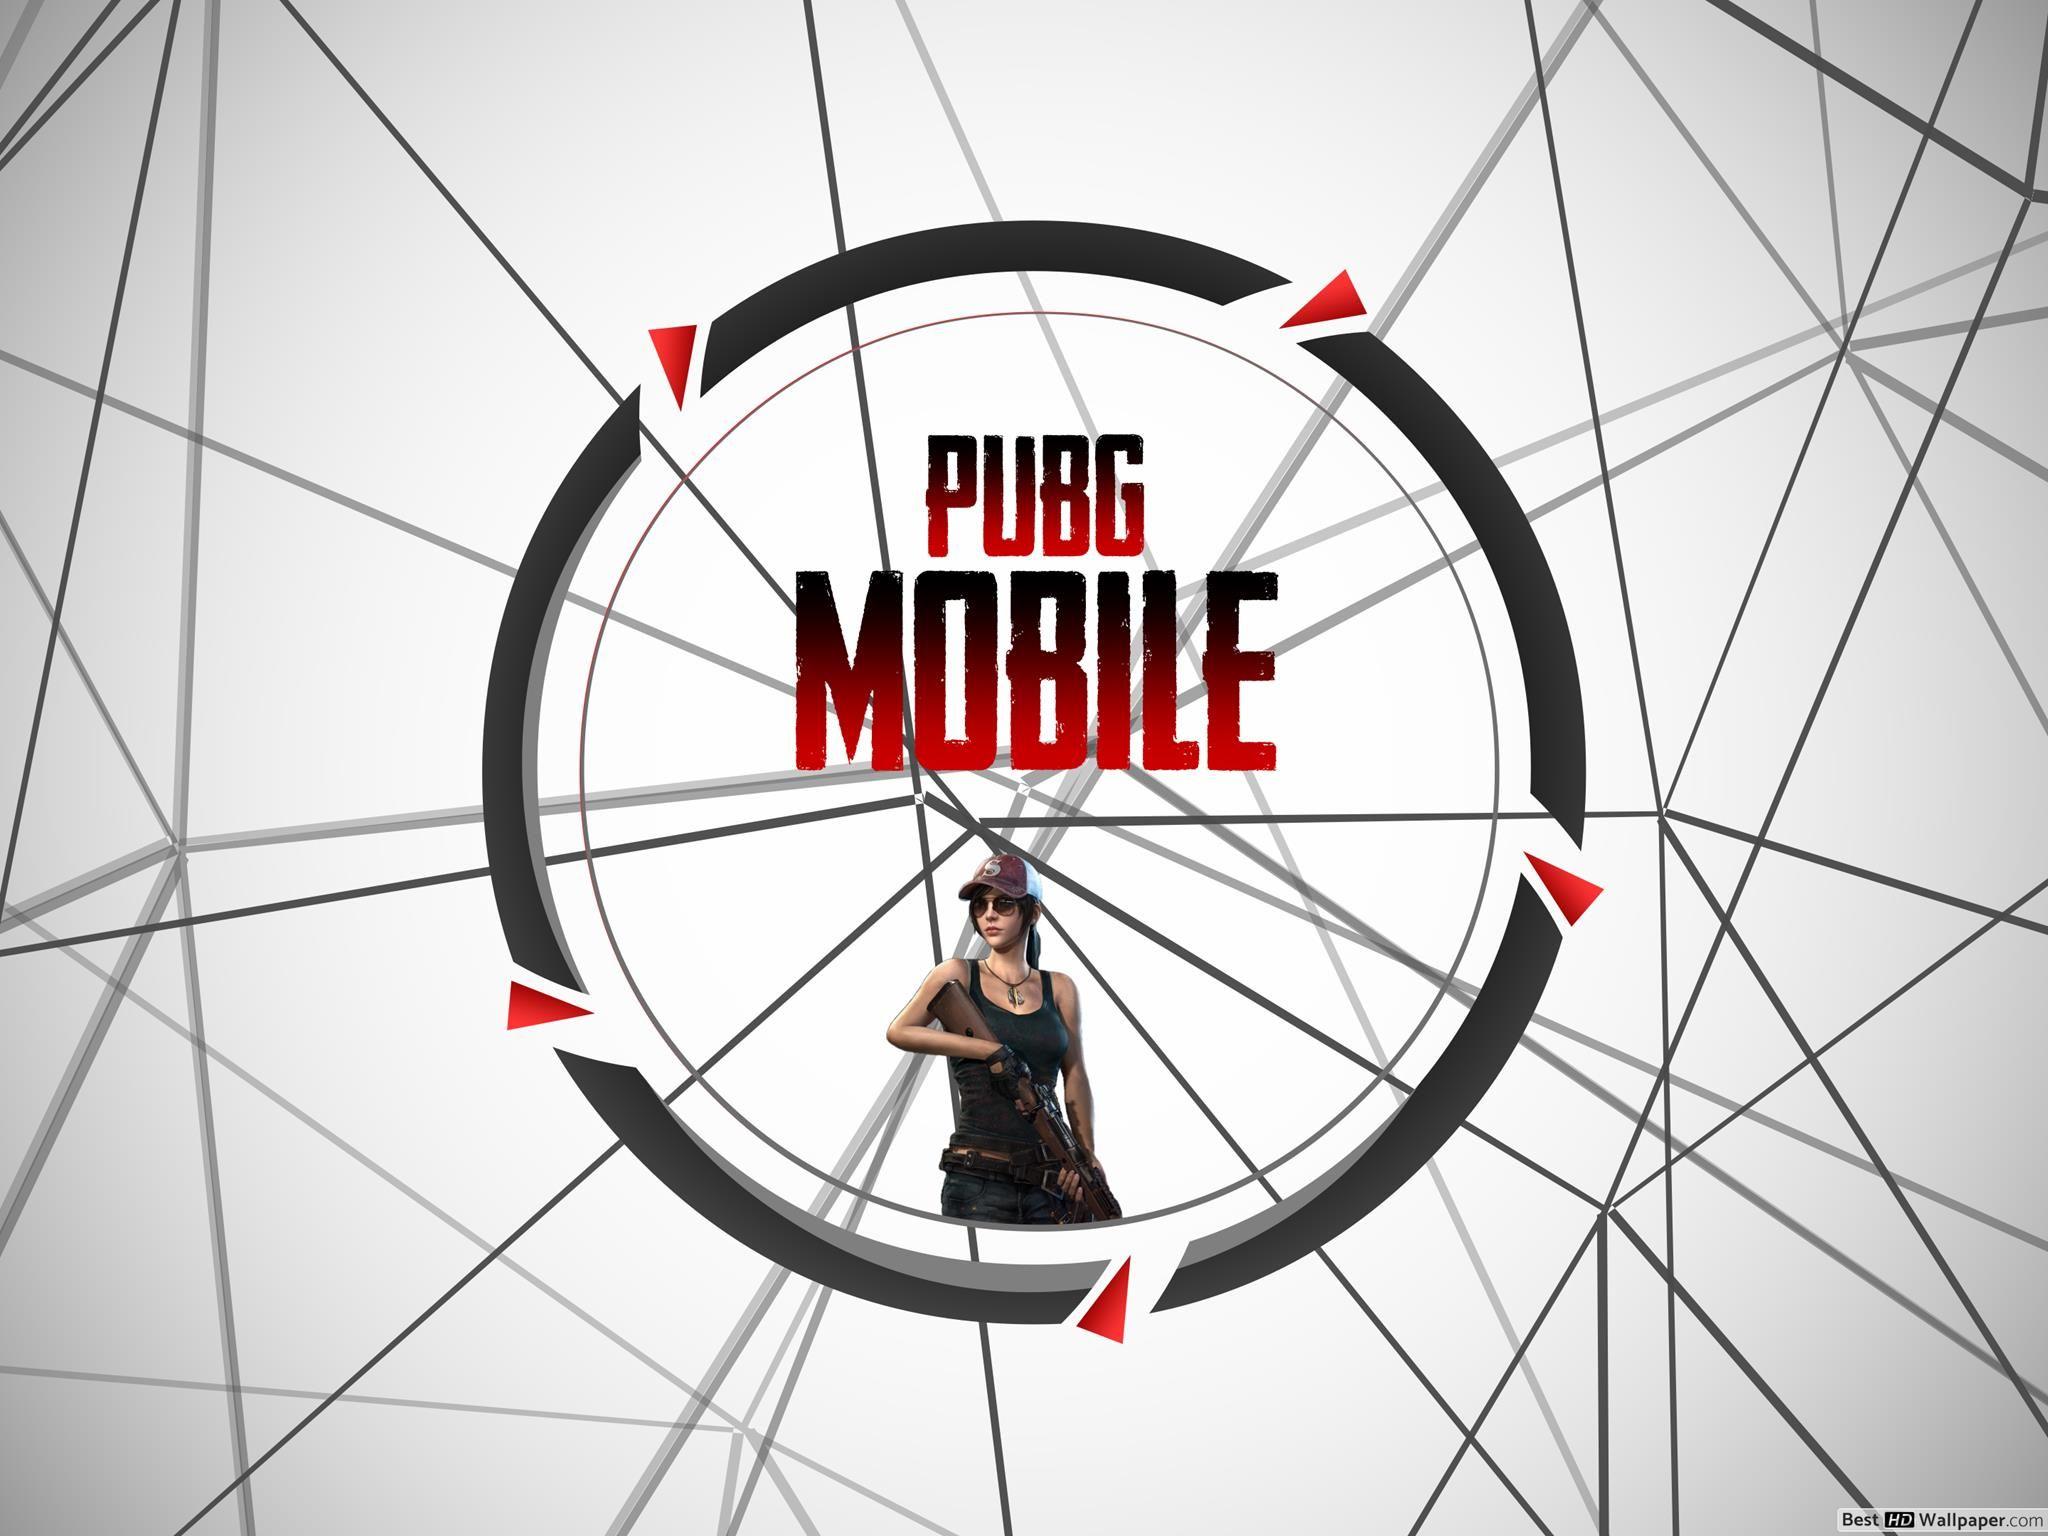 Pubg Mobile Hd Hd Wallpaper Download - Cave Wallpaper Pubg Mobile Hd , HD Wallpaper & Backgrounds